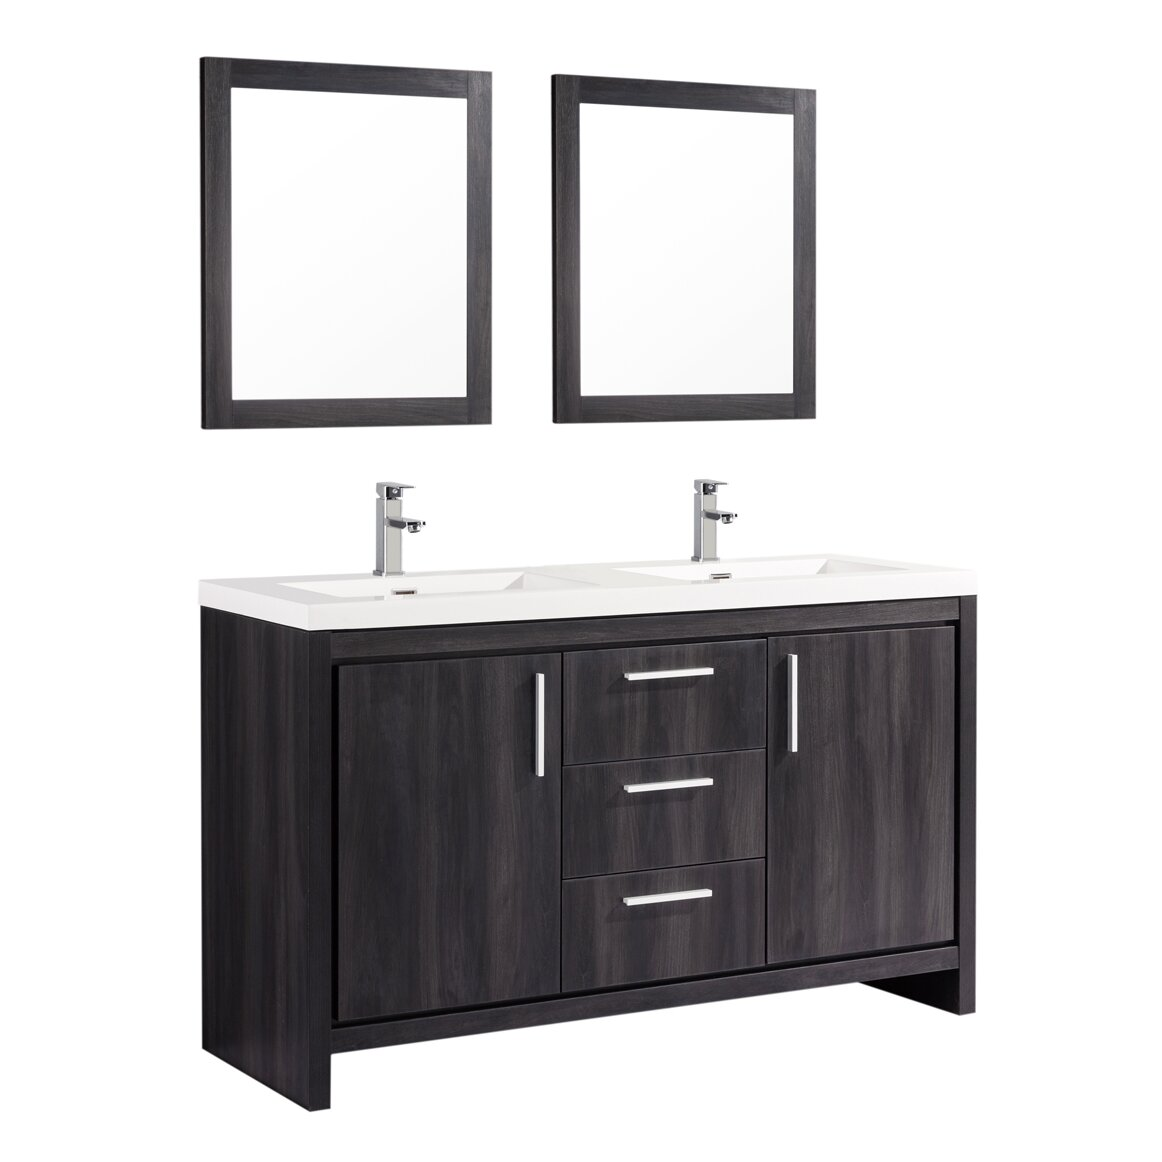 "MTDVanities Miami 59"" Double Sink Modern Bathroom Vanity"